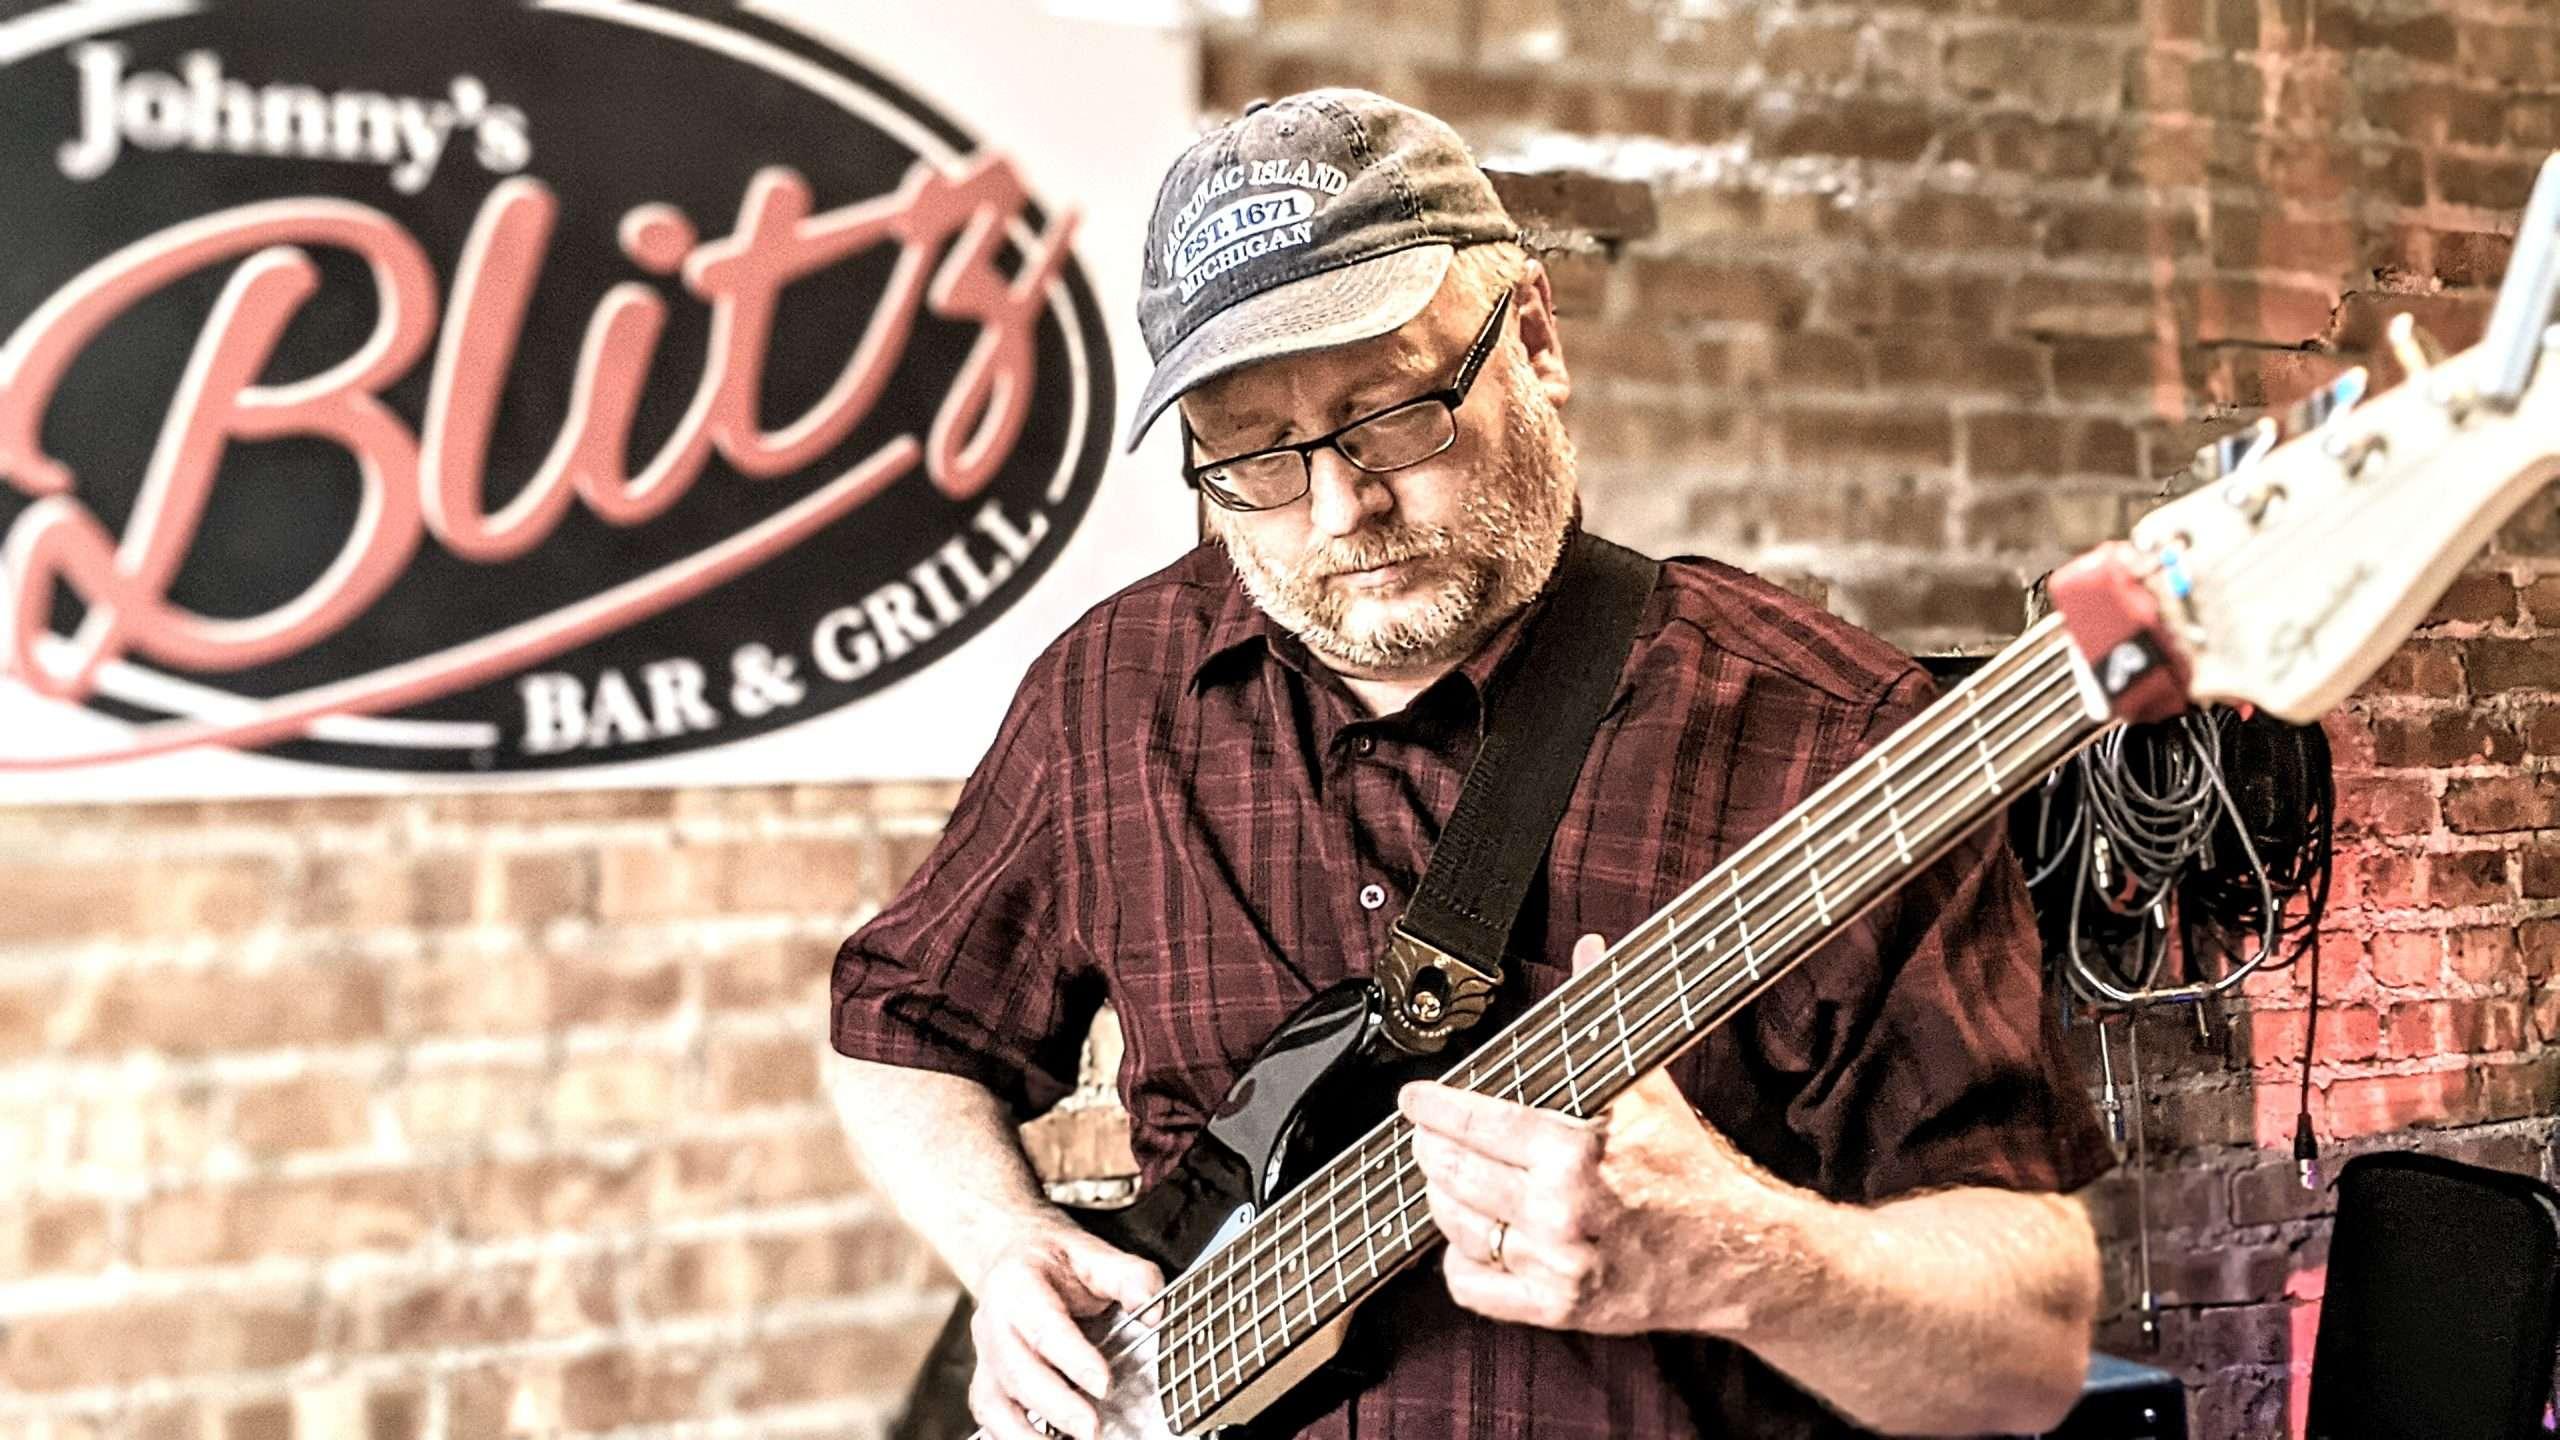 Brian's Open Mic Experiences At Johnny's Blitz Bar & Grill 17